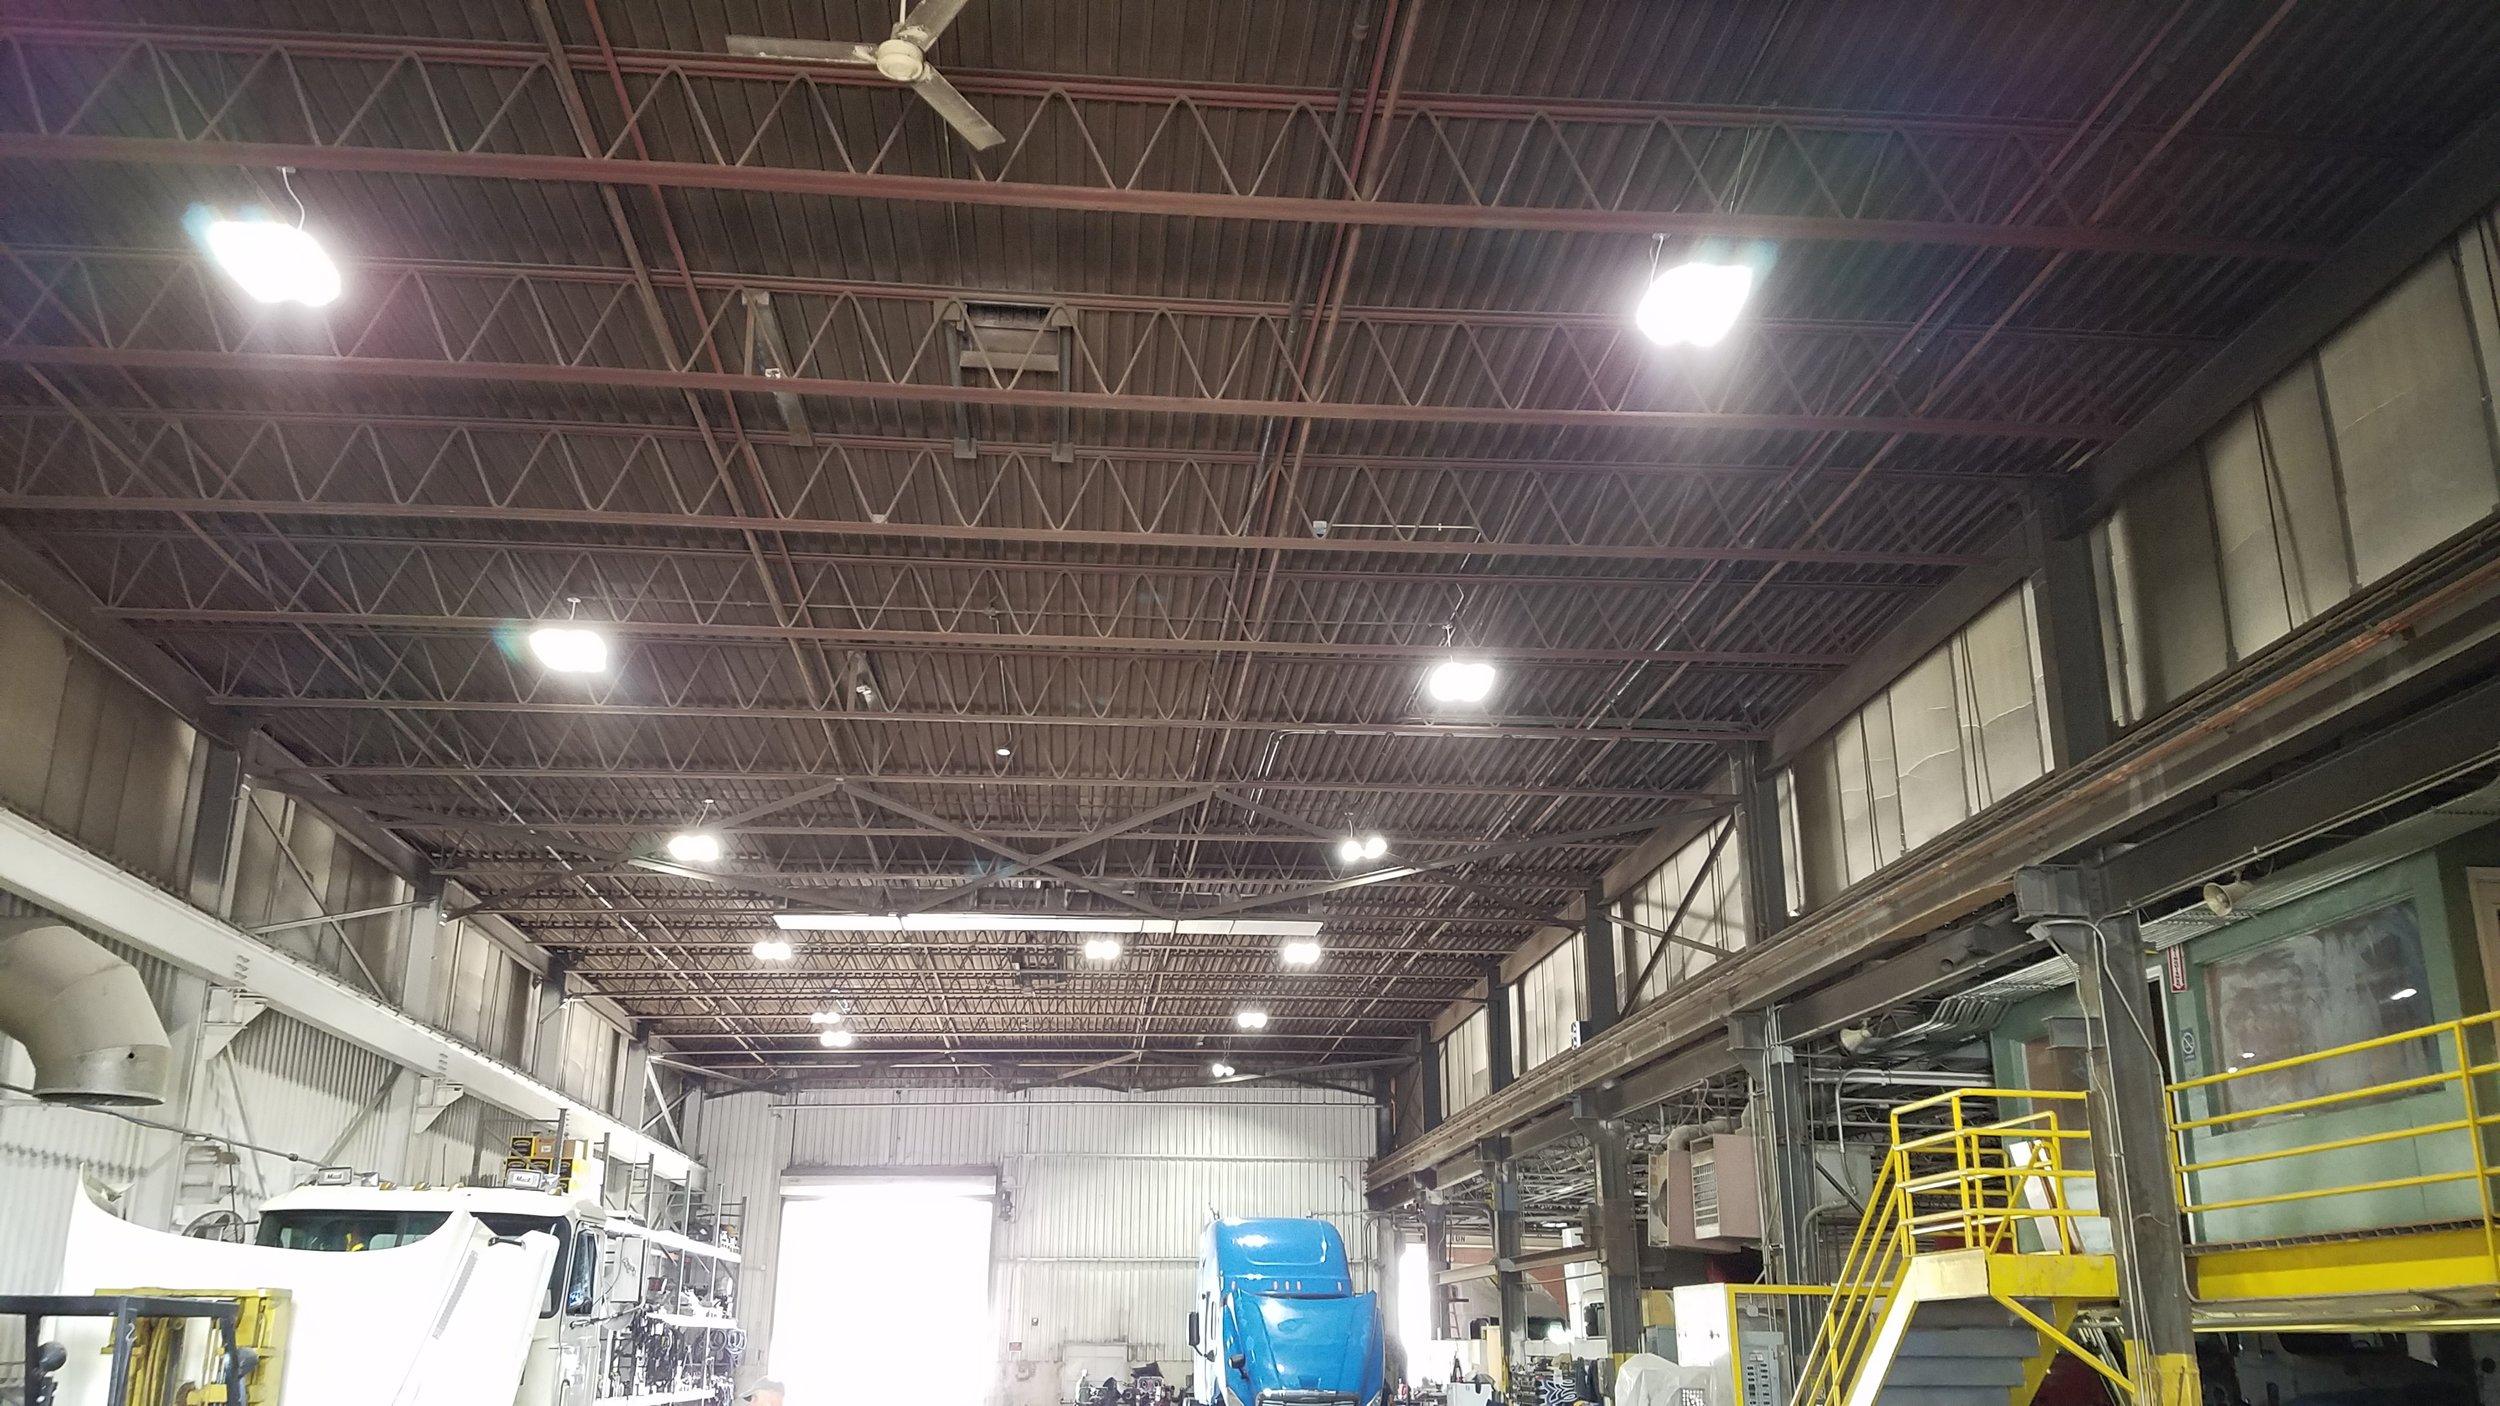 LED HiBay with Daylight Harvesting Sensors